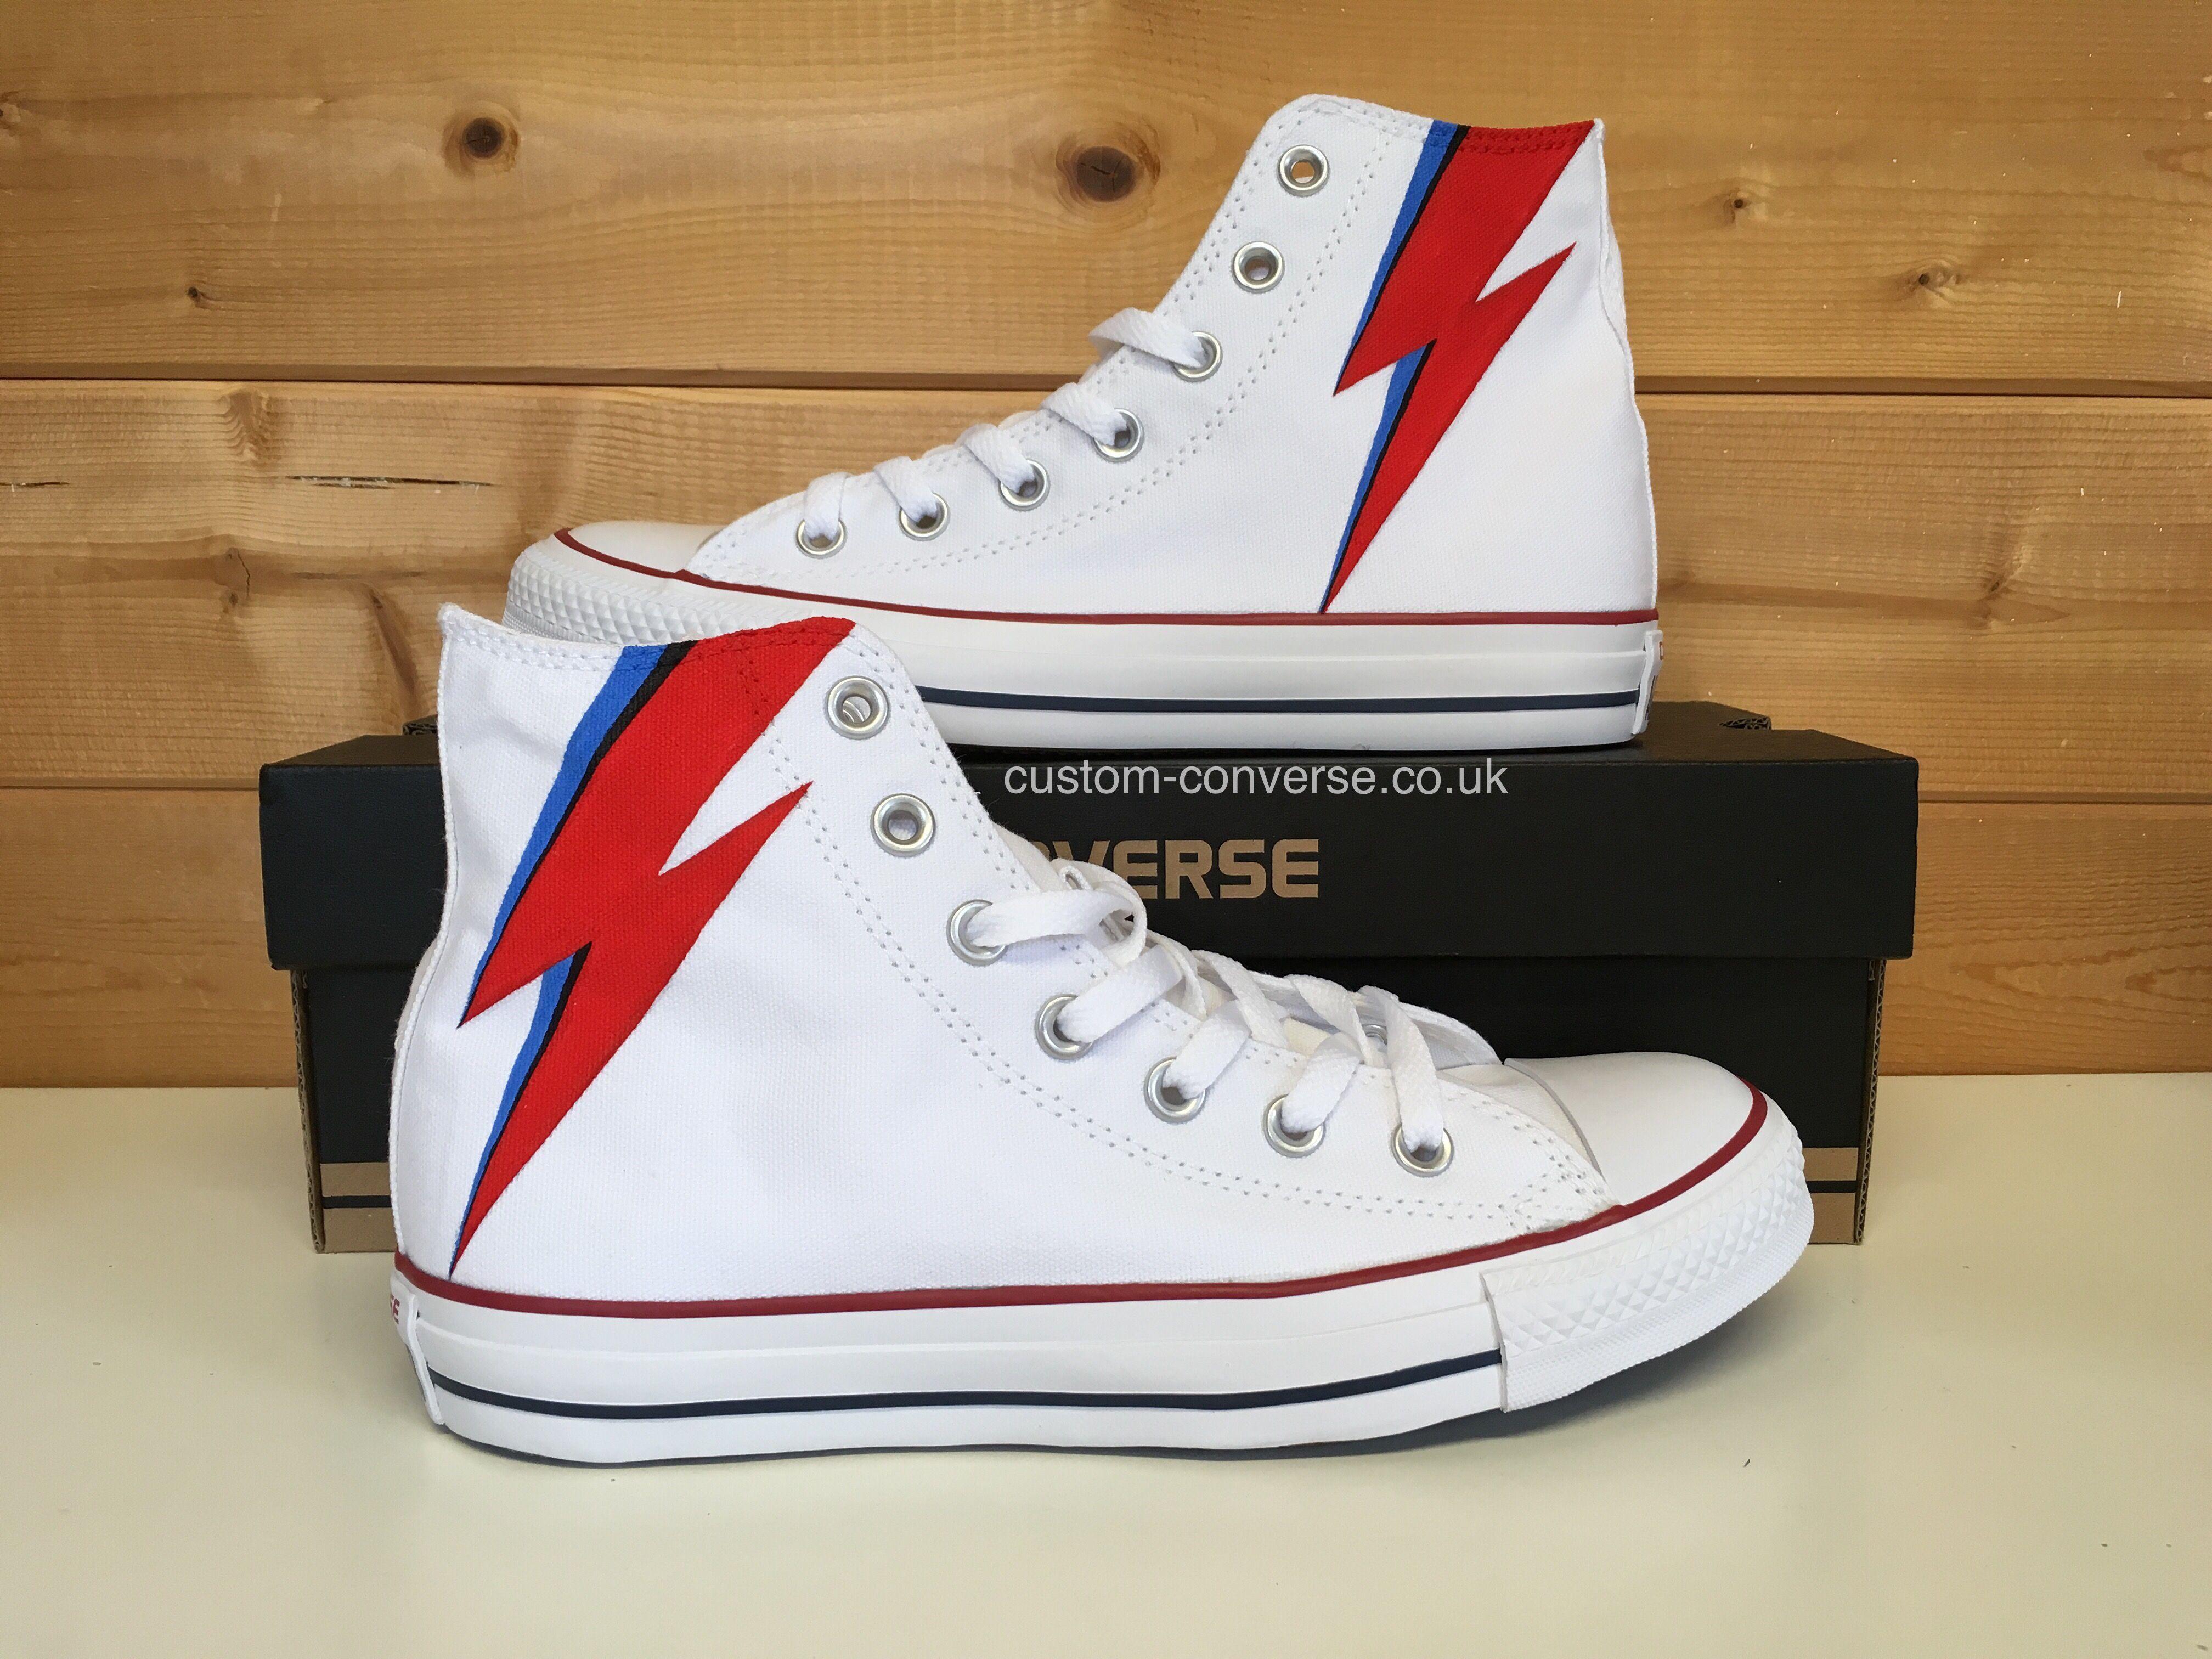 5ab52c5b71d David Bowie Aladdin Sane Converse  bowie  davidbowie  customconverse   aladdinsane